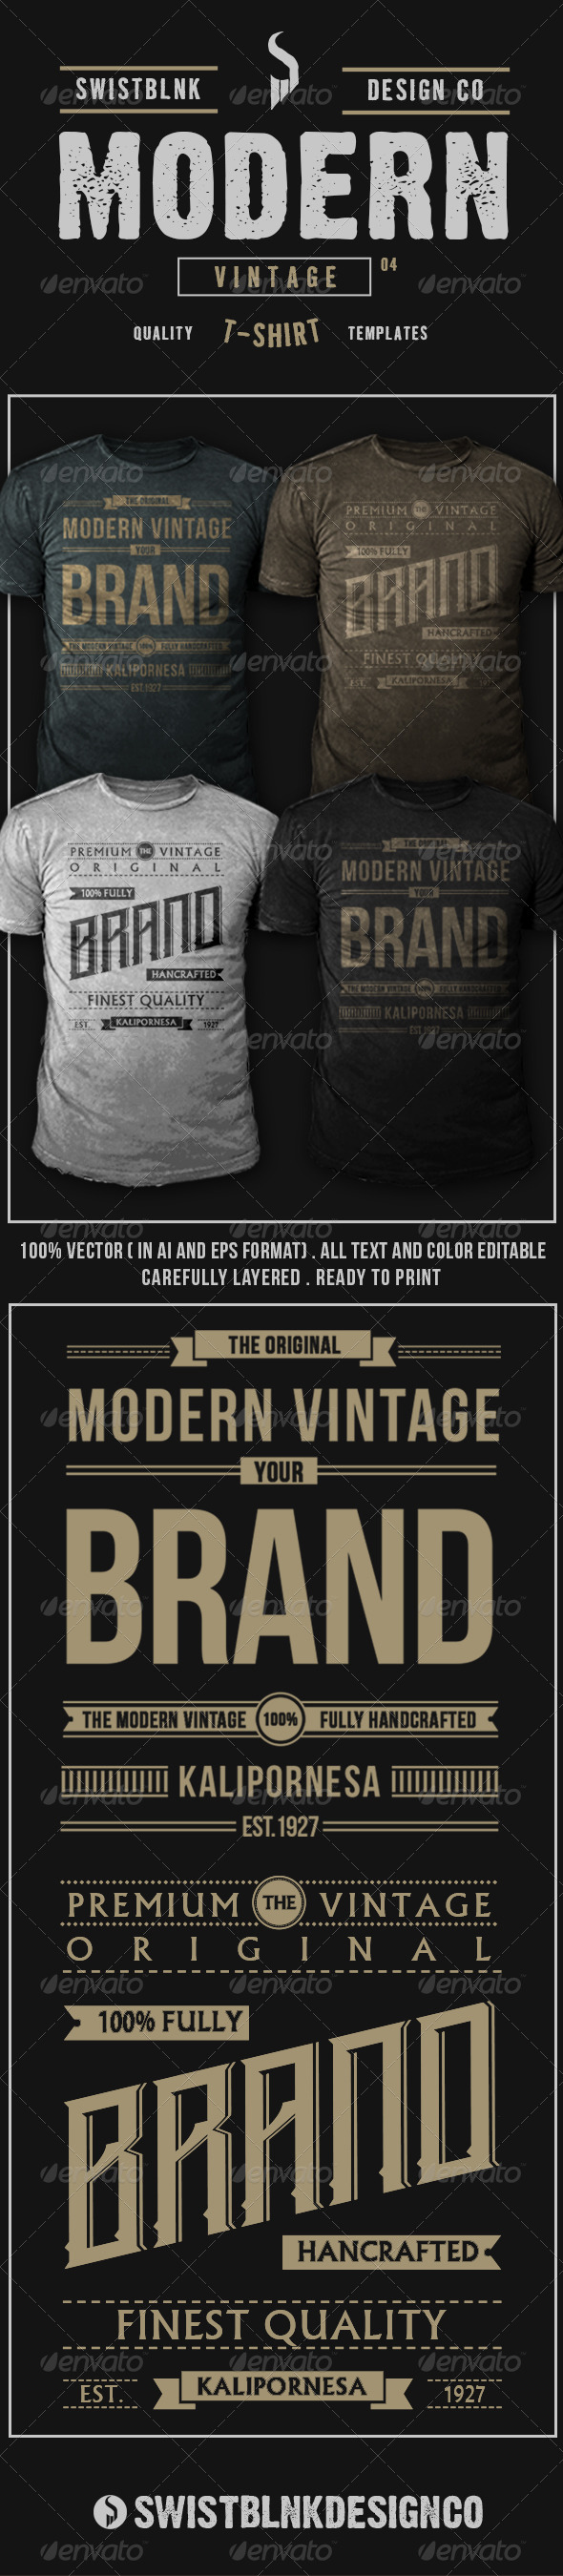 Modern Vintage T-Shirt 04 - Designs T-Shirts